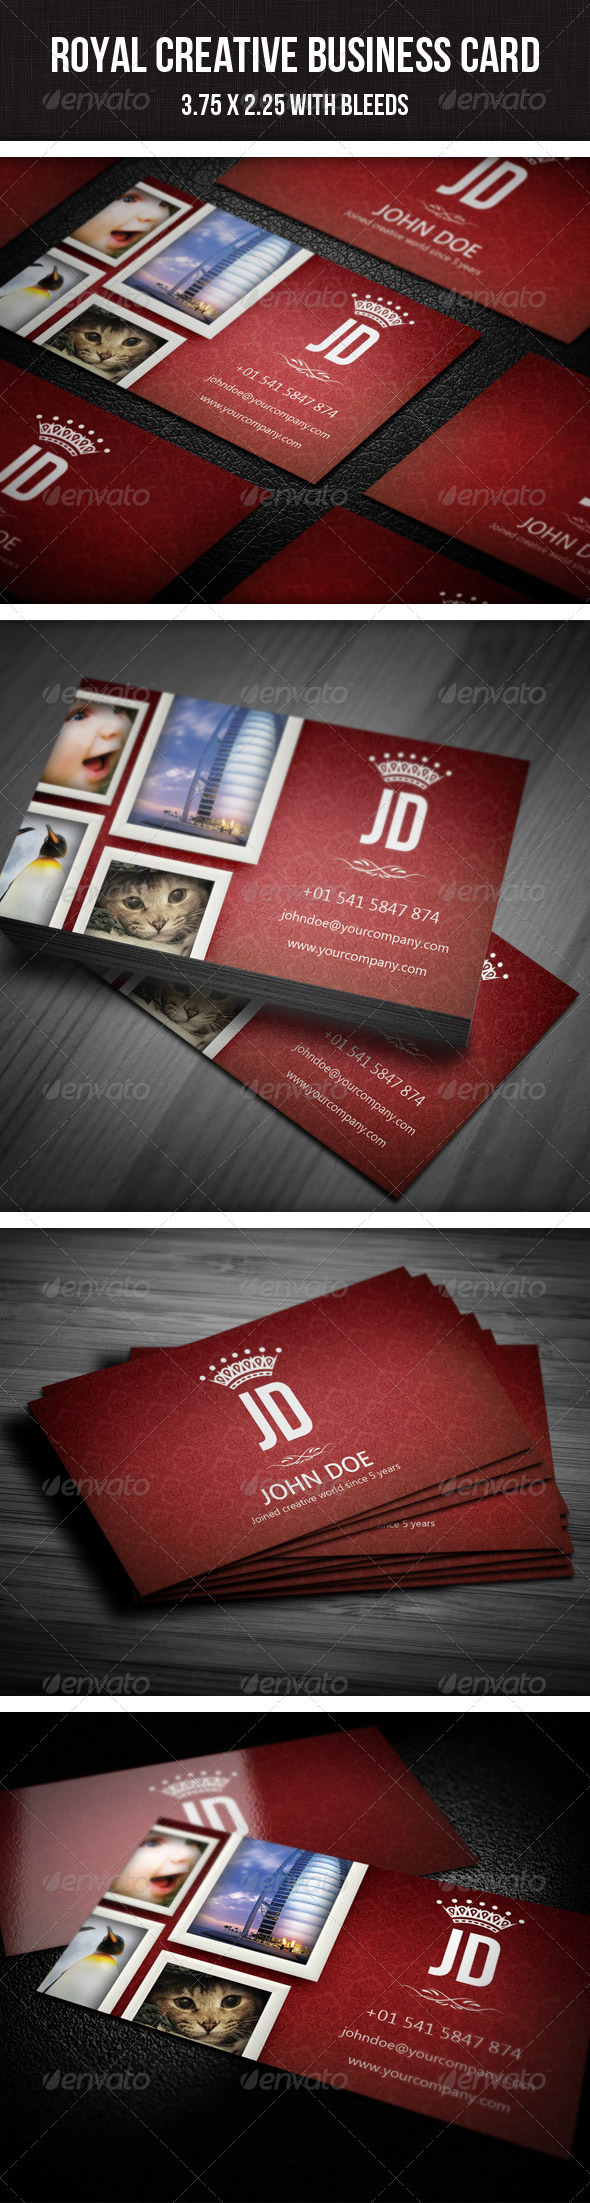 Royal Creative Photographer Business Card - 16 | Photographer ...